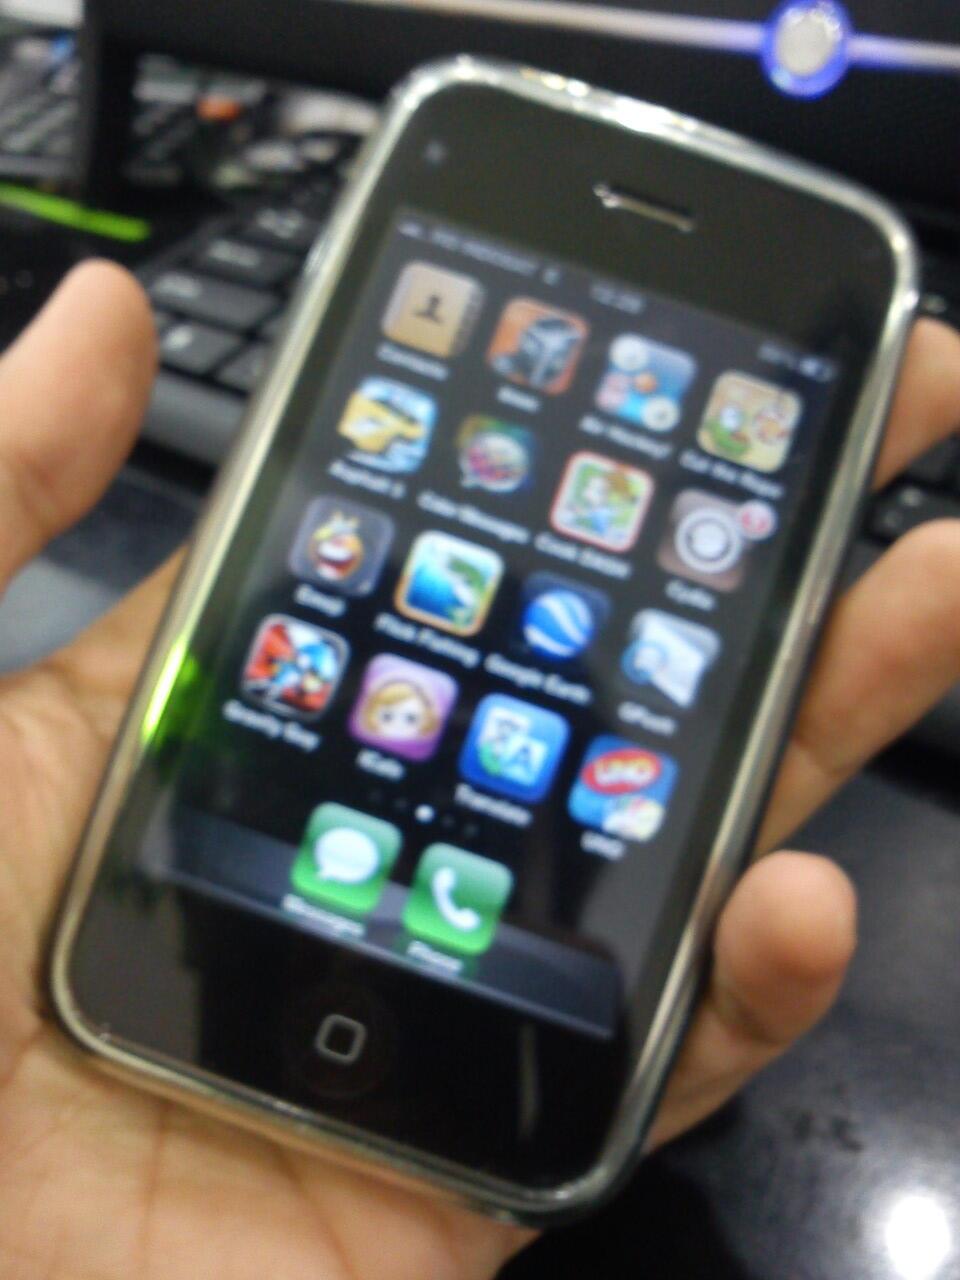 SOLO IPHONE 3G 16GB WHITE